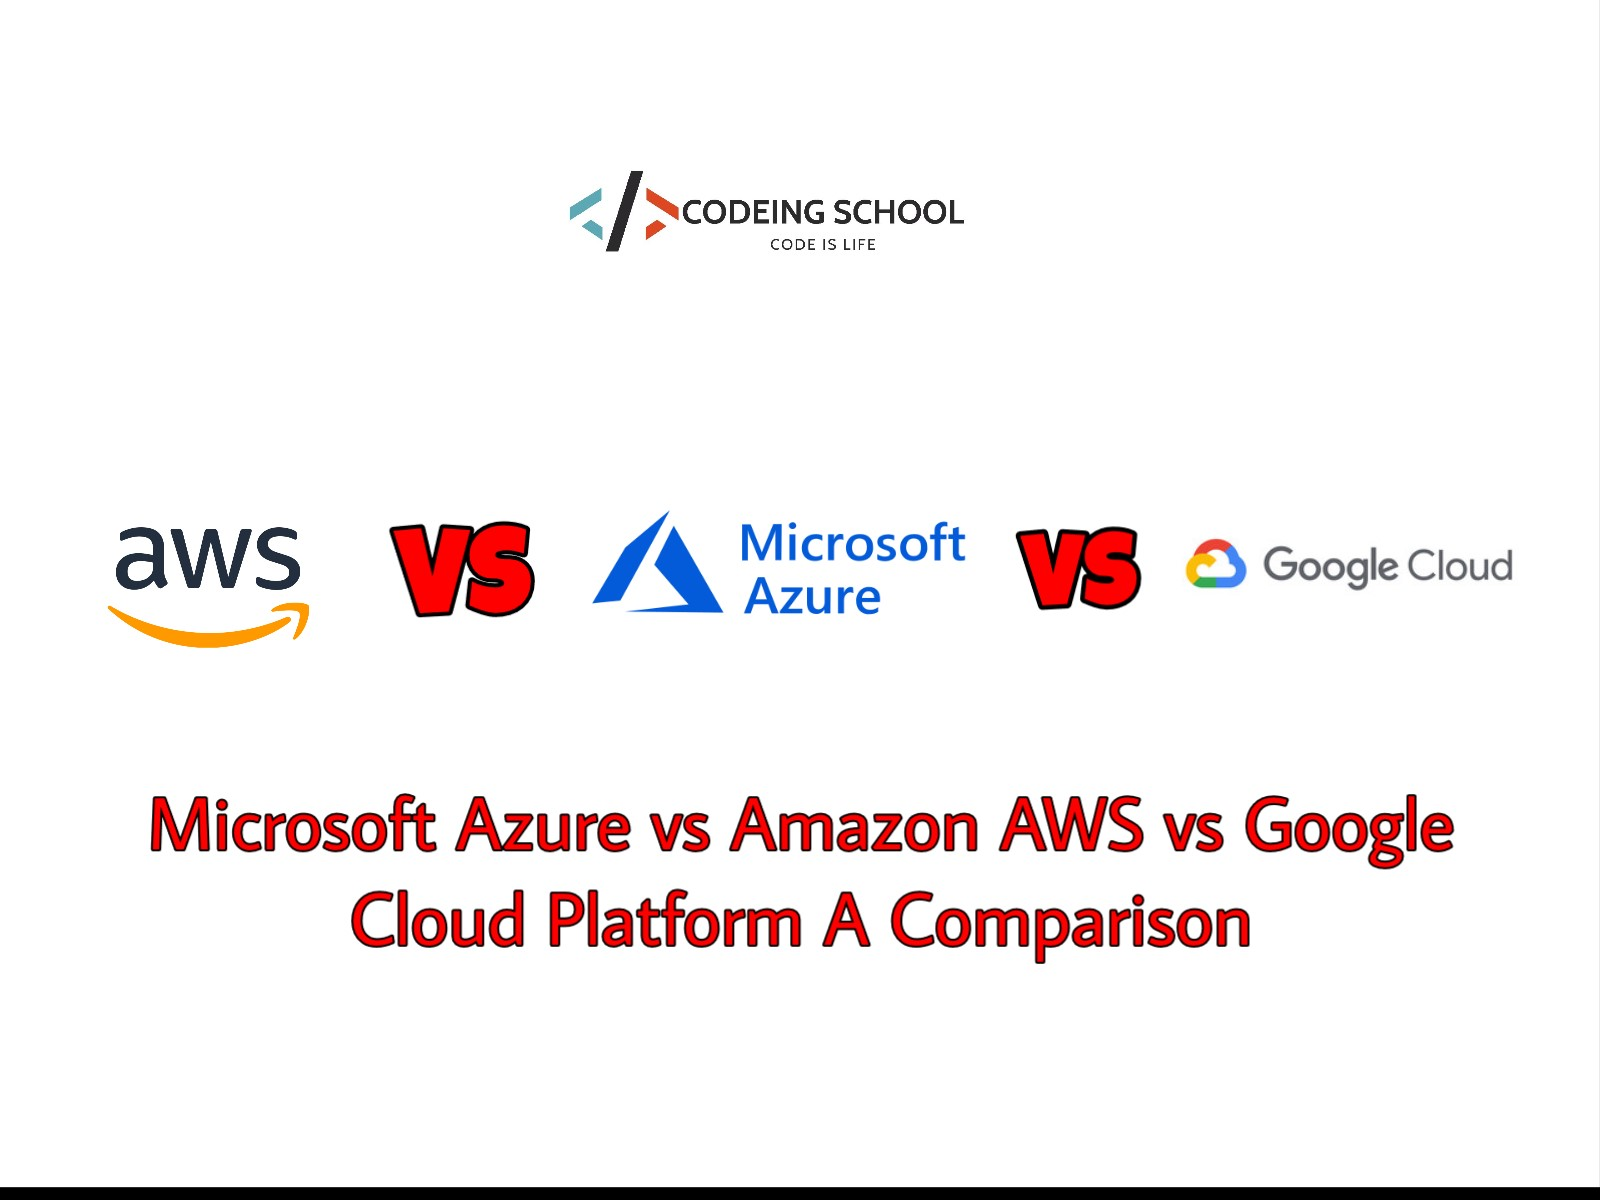 Microsoft Azure vs Amazon AWS vs Google Cloud Platform